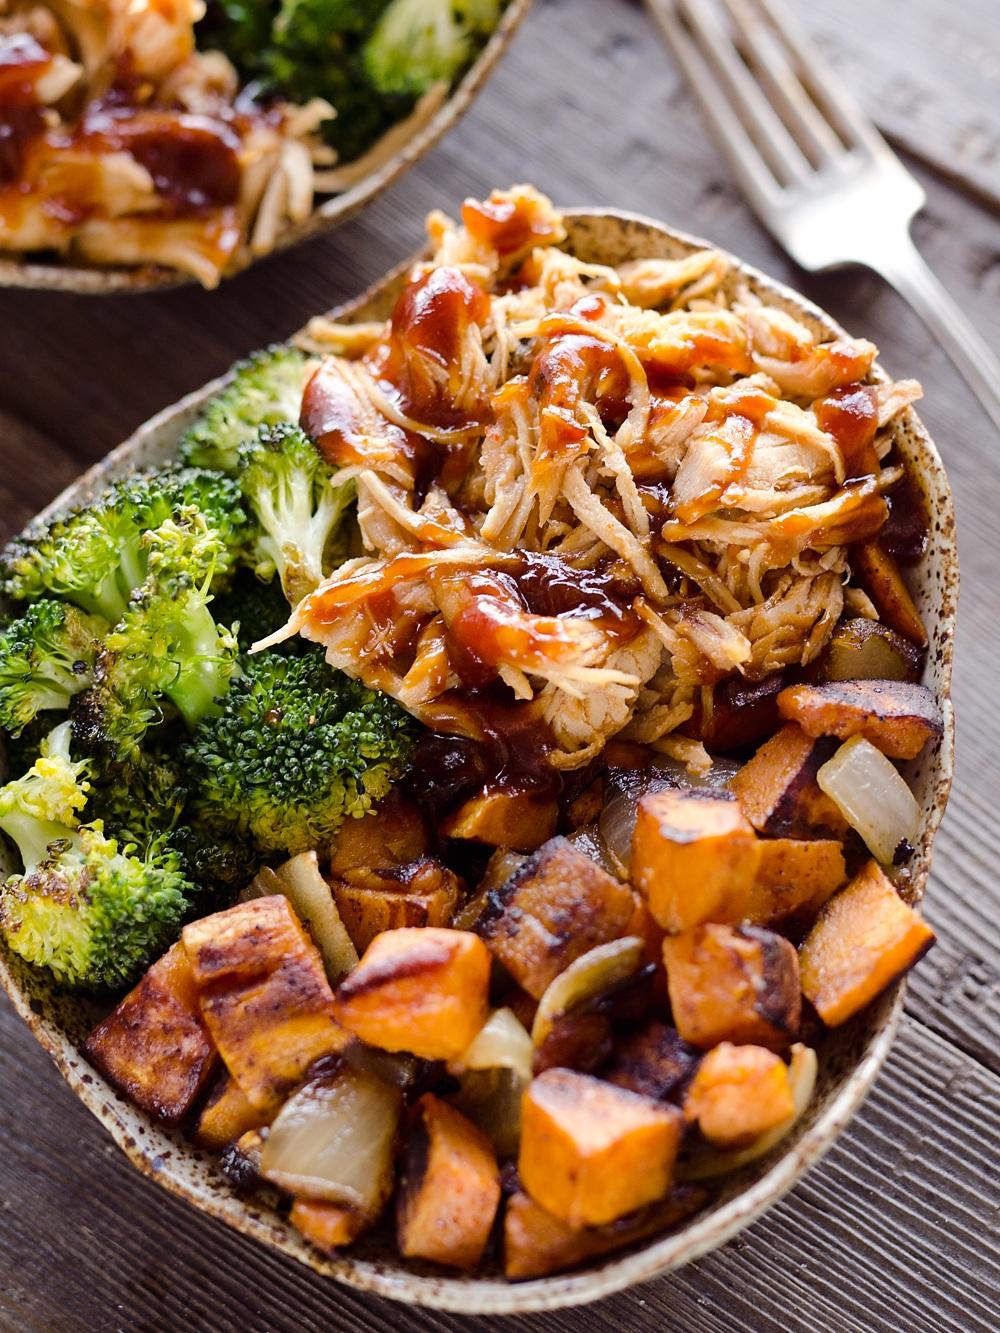 BBQ-Chicken-Roasted-Sweet-Potato-Bowls-The-Creative-Bite-.jpg